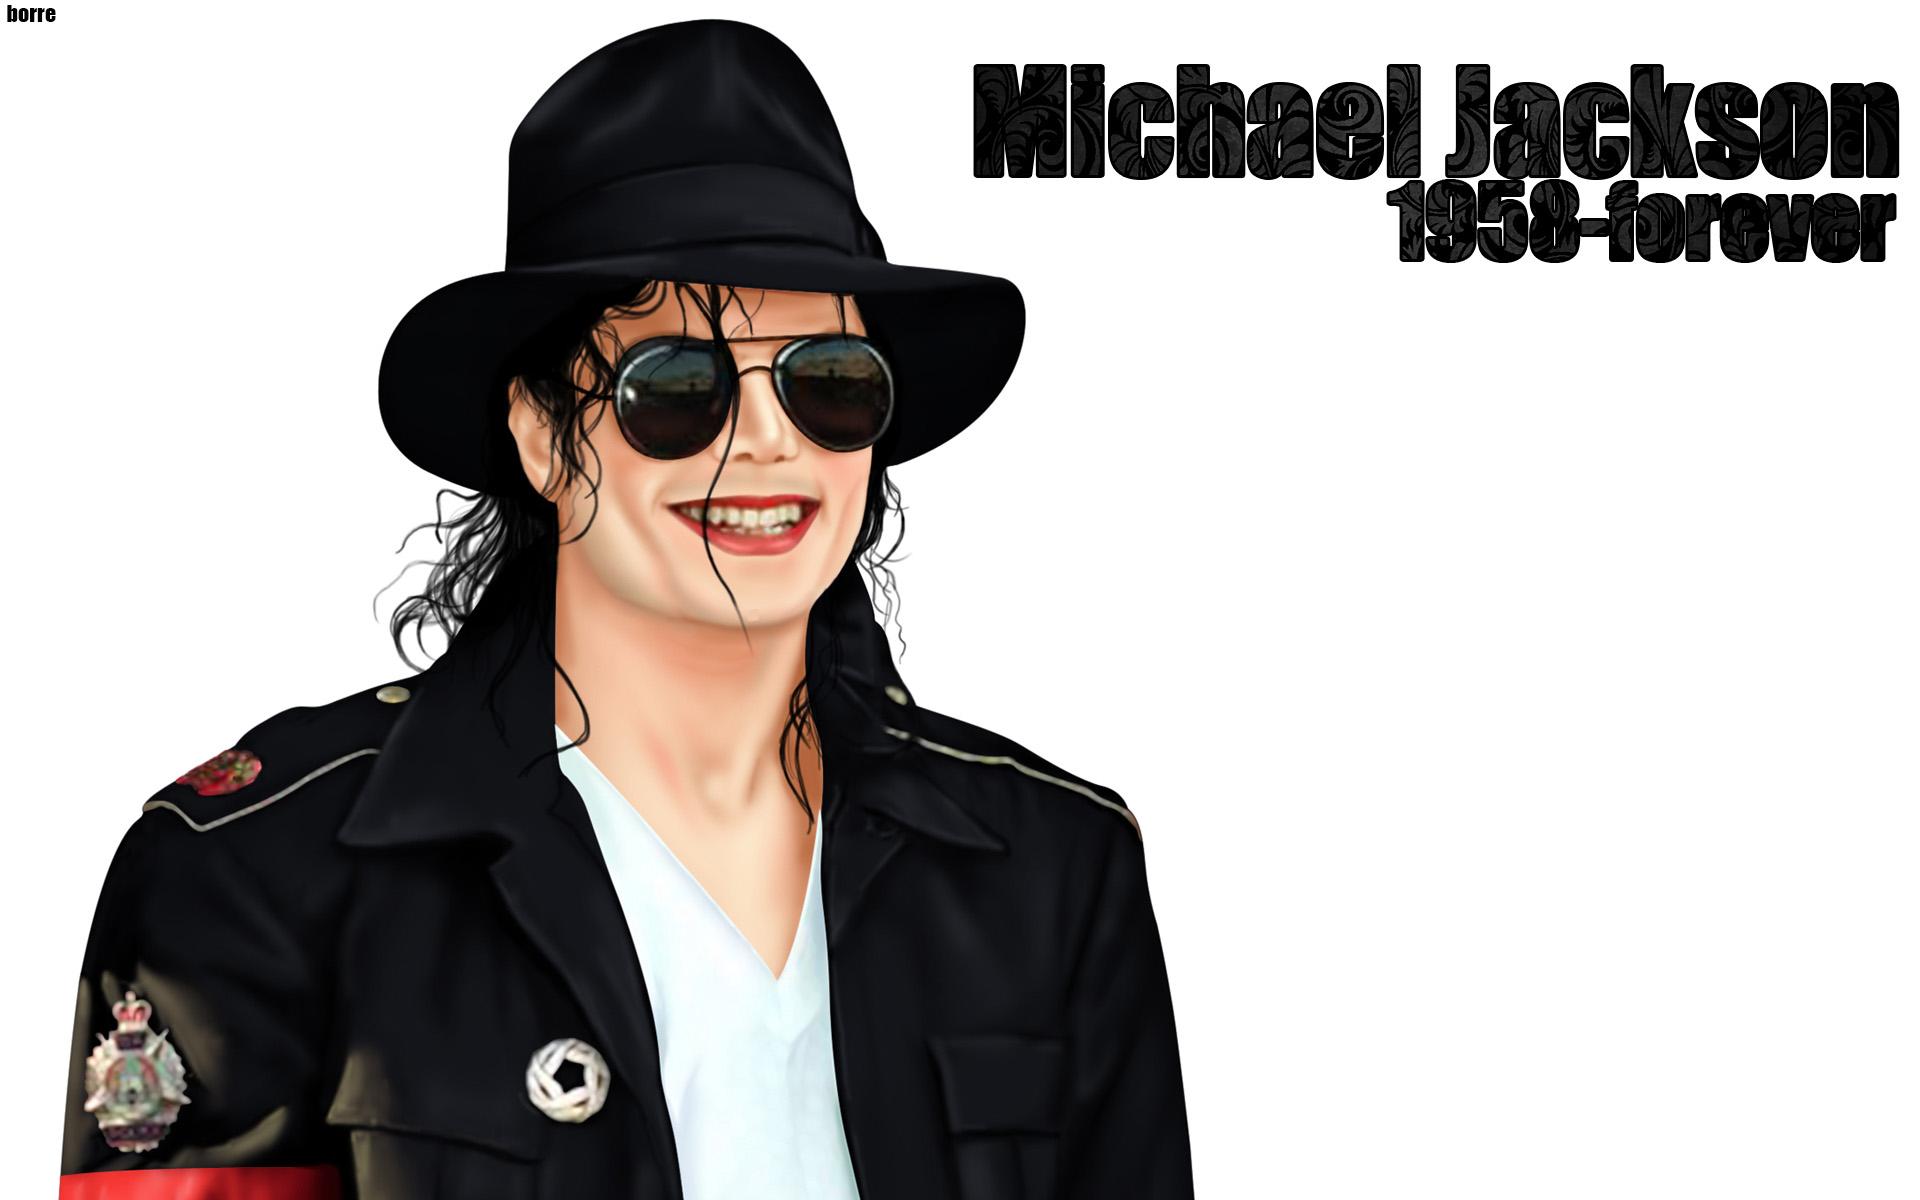 Michael jackson wallpaper hd   pixelstalk. Net.